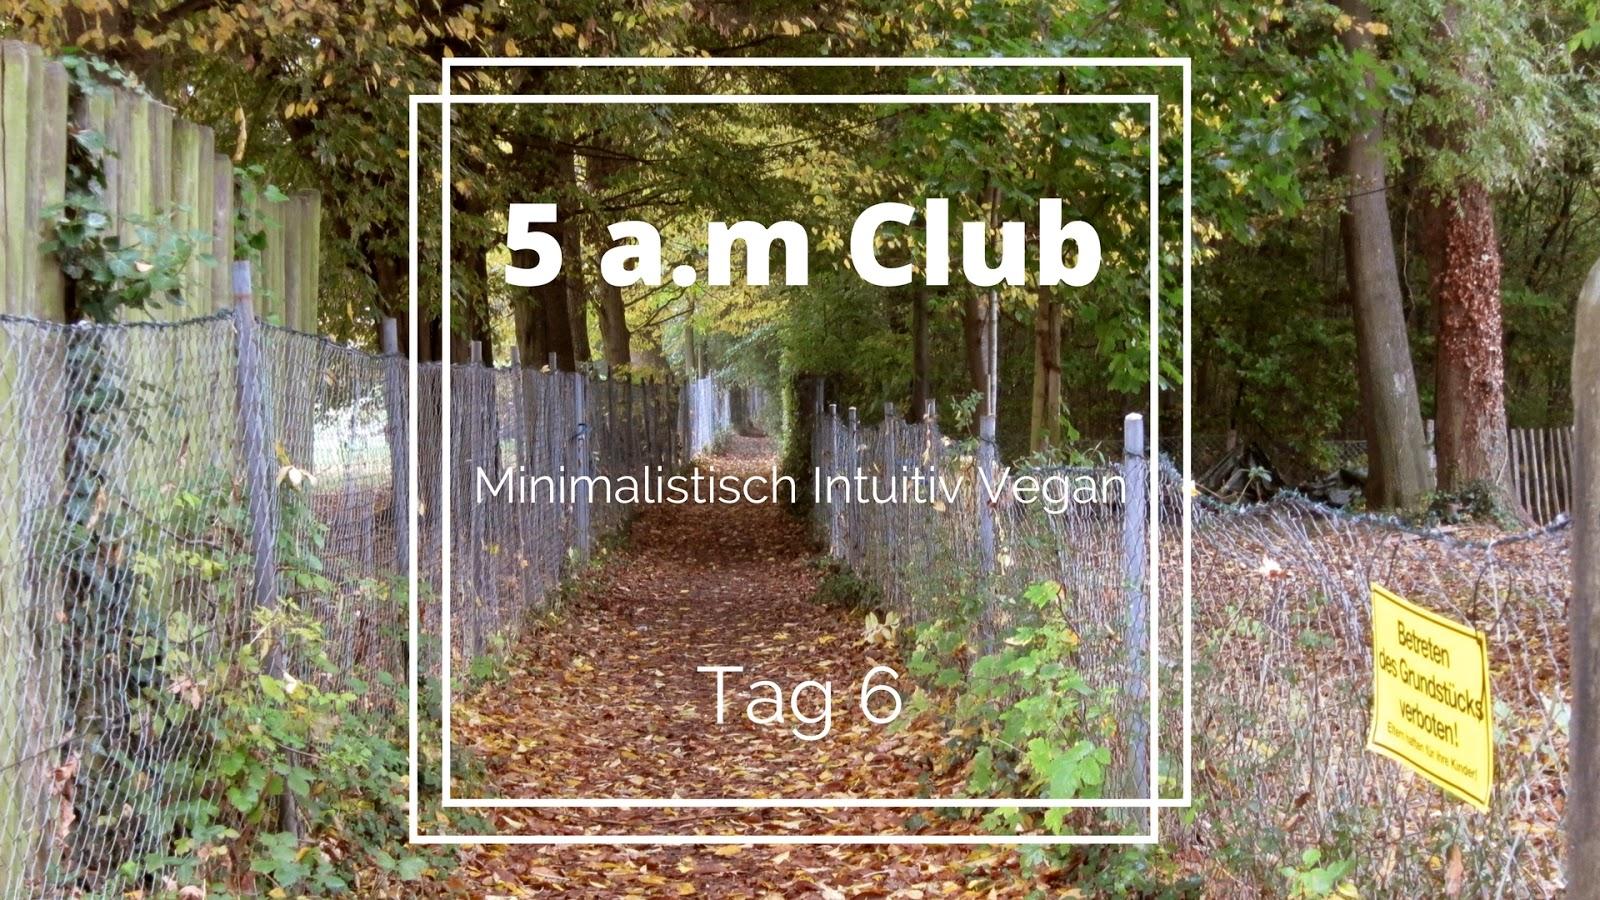 5 a m club tag 6 minimalistisch intuitiv vegan. Black Bedroom Furniture Sets. Home Design Ideas